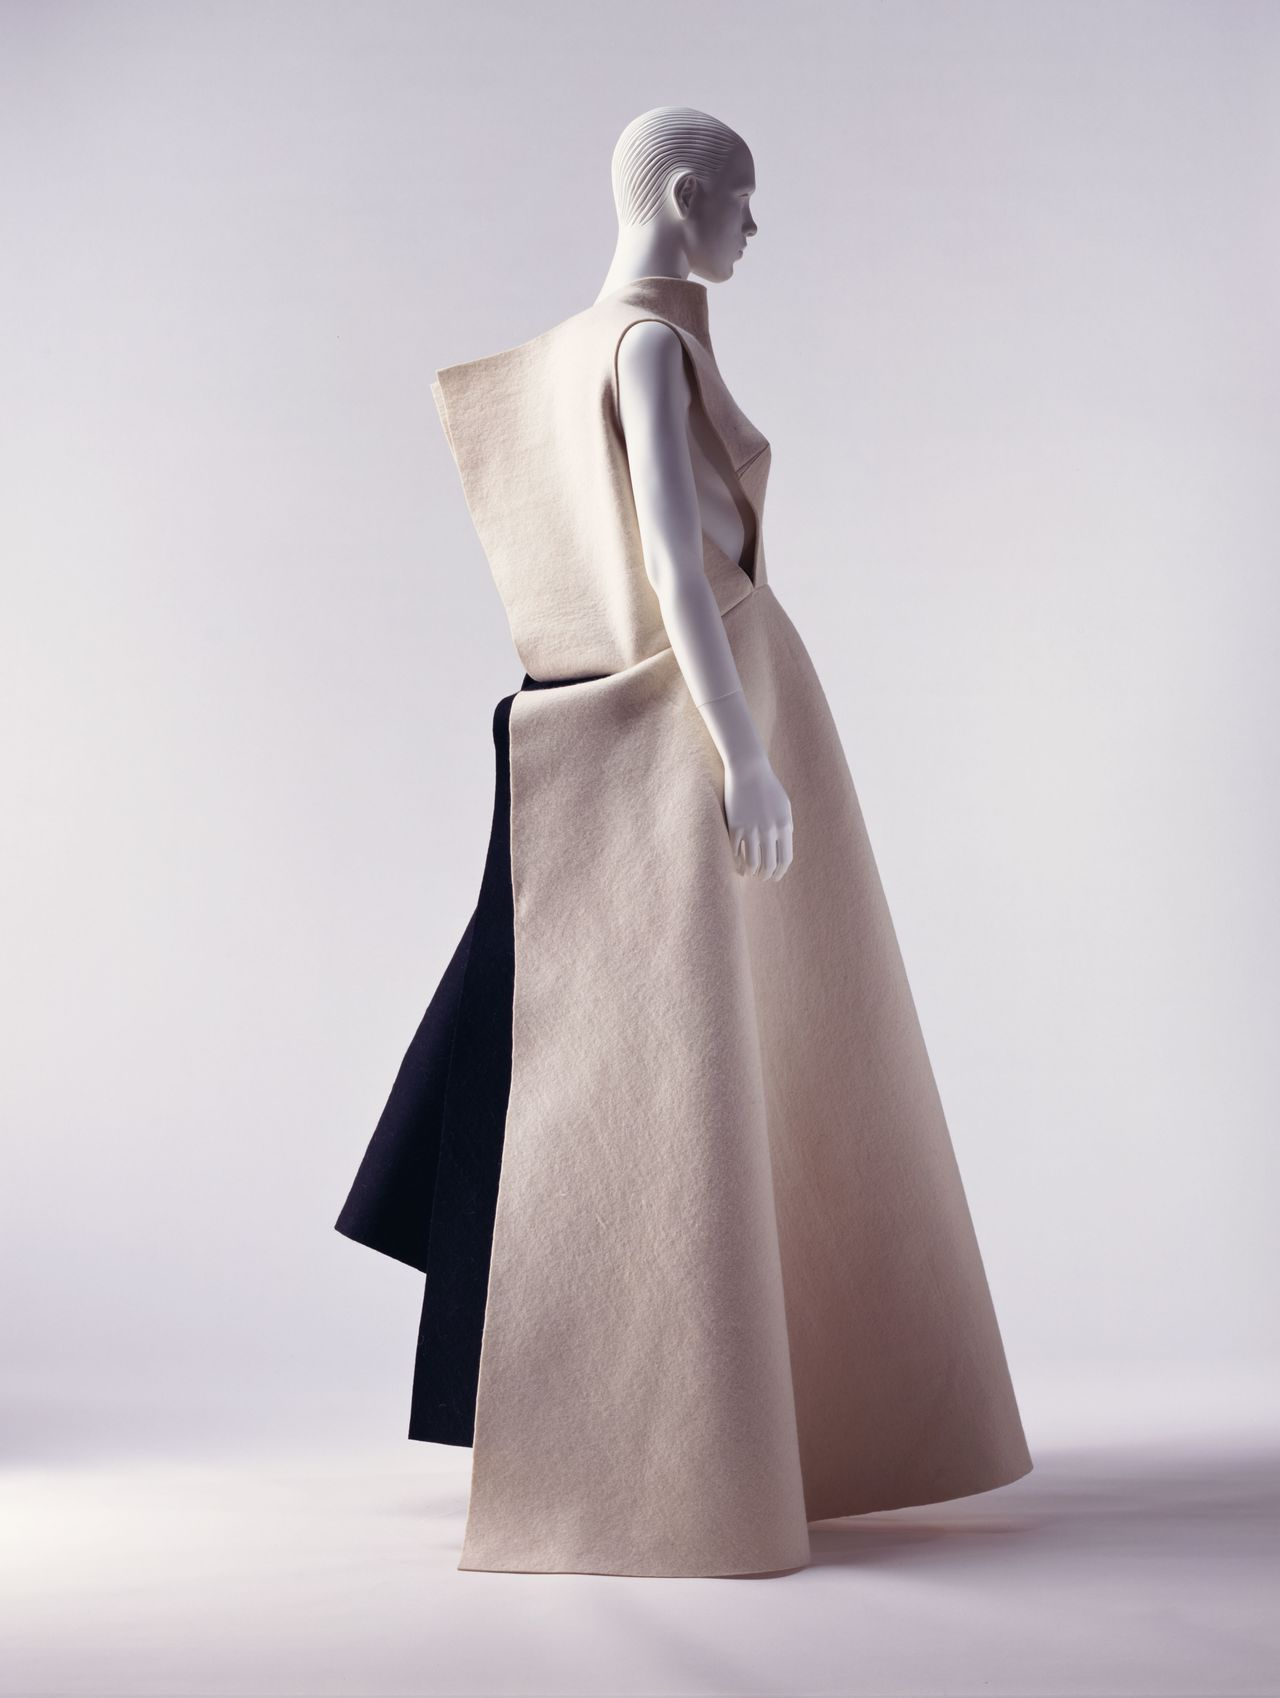 Платье и юбка от Ёдзи Ямамото, осень-зима 1996. Фото Хатакэямы Такаси (© Киотский институт костюма)